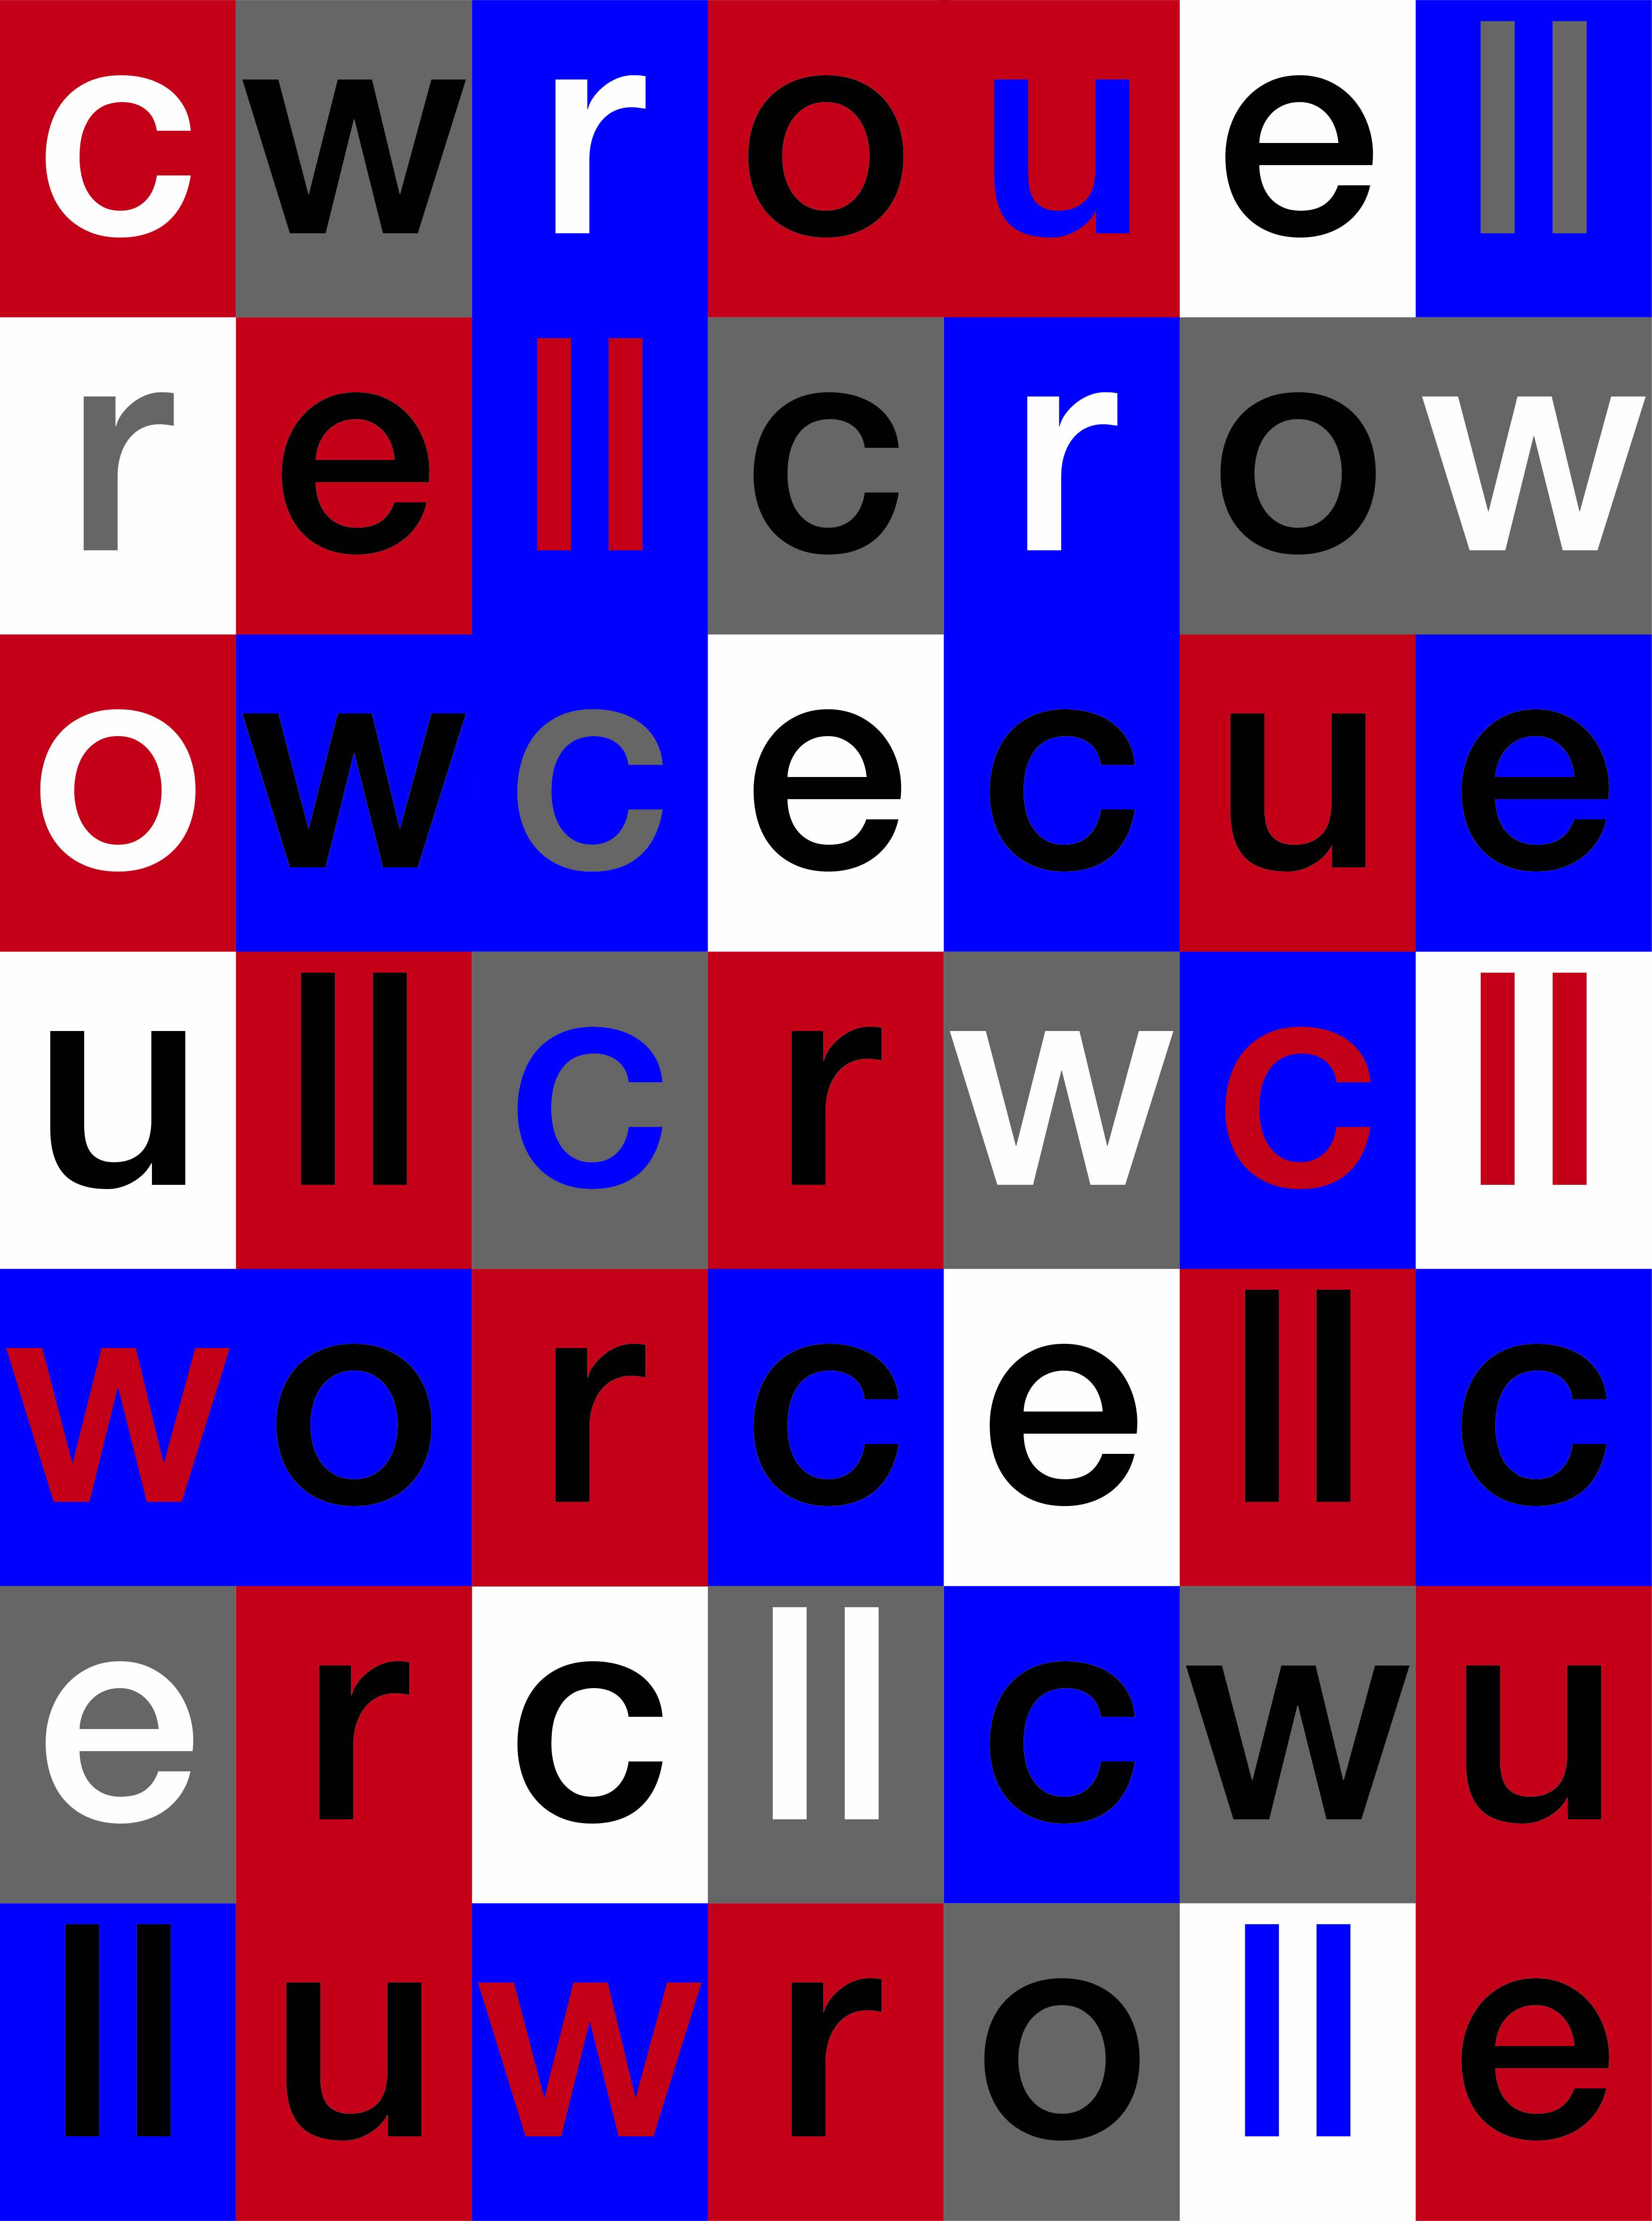 Tribute to Win Crouwel by teiga, studio. - Creative Work